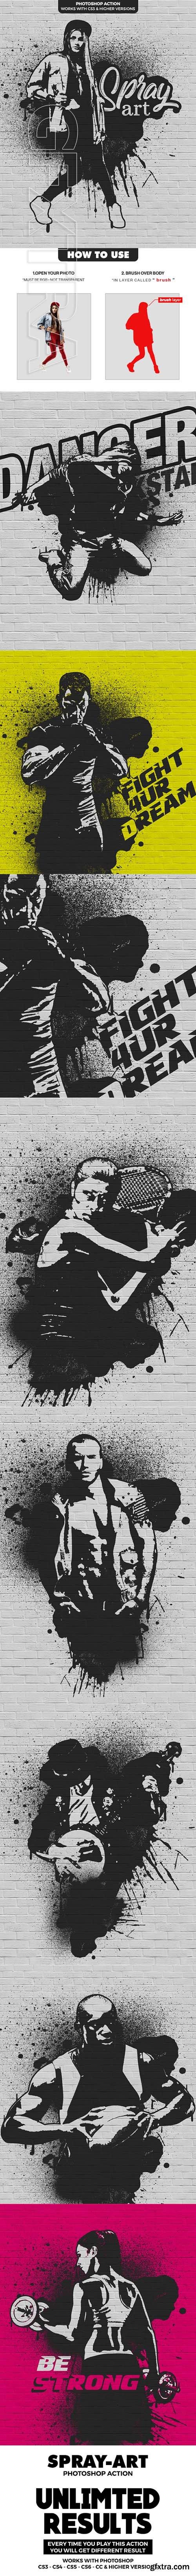 GraphicRiver - Spray Art Photoshop Action 21885362